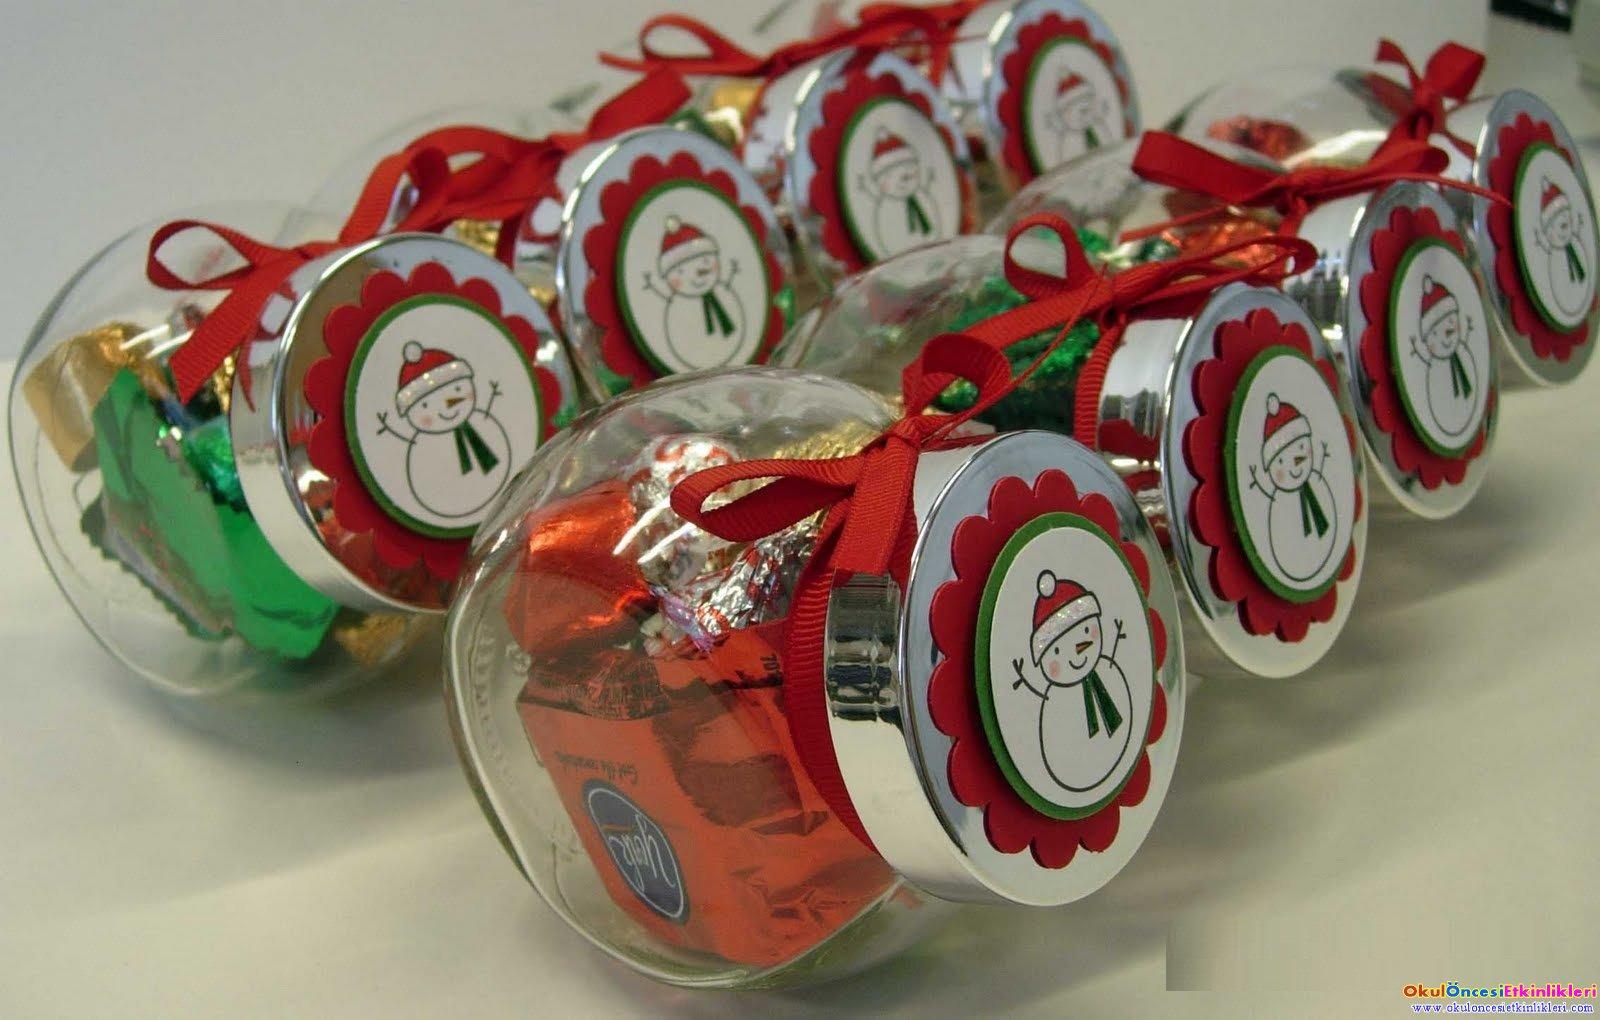 Y lba s priz hediyeler okul nces etk nl kler for Edible christmas gift ideas to make